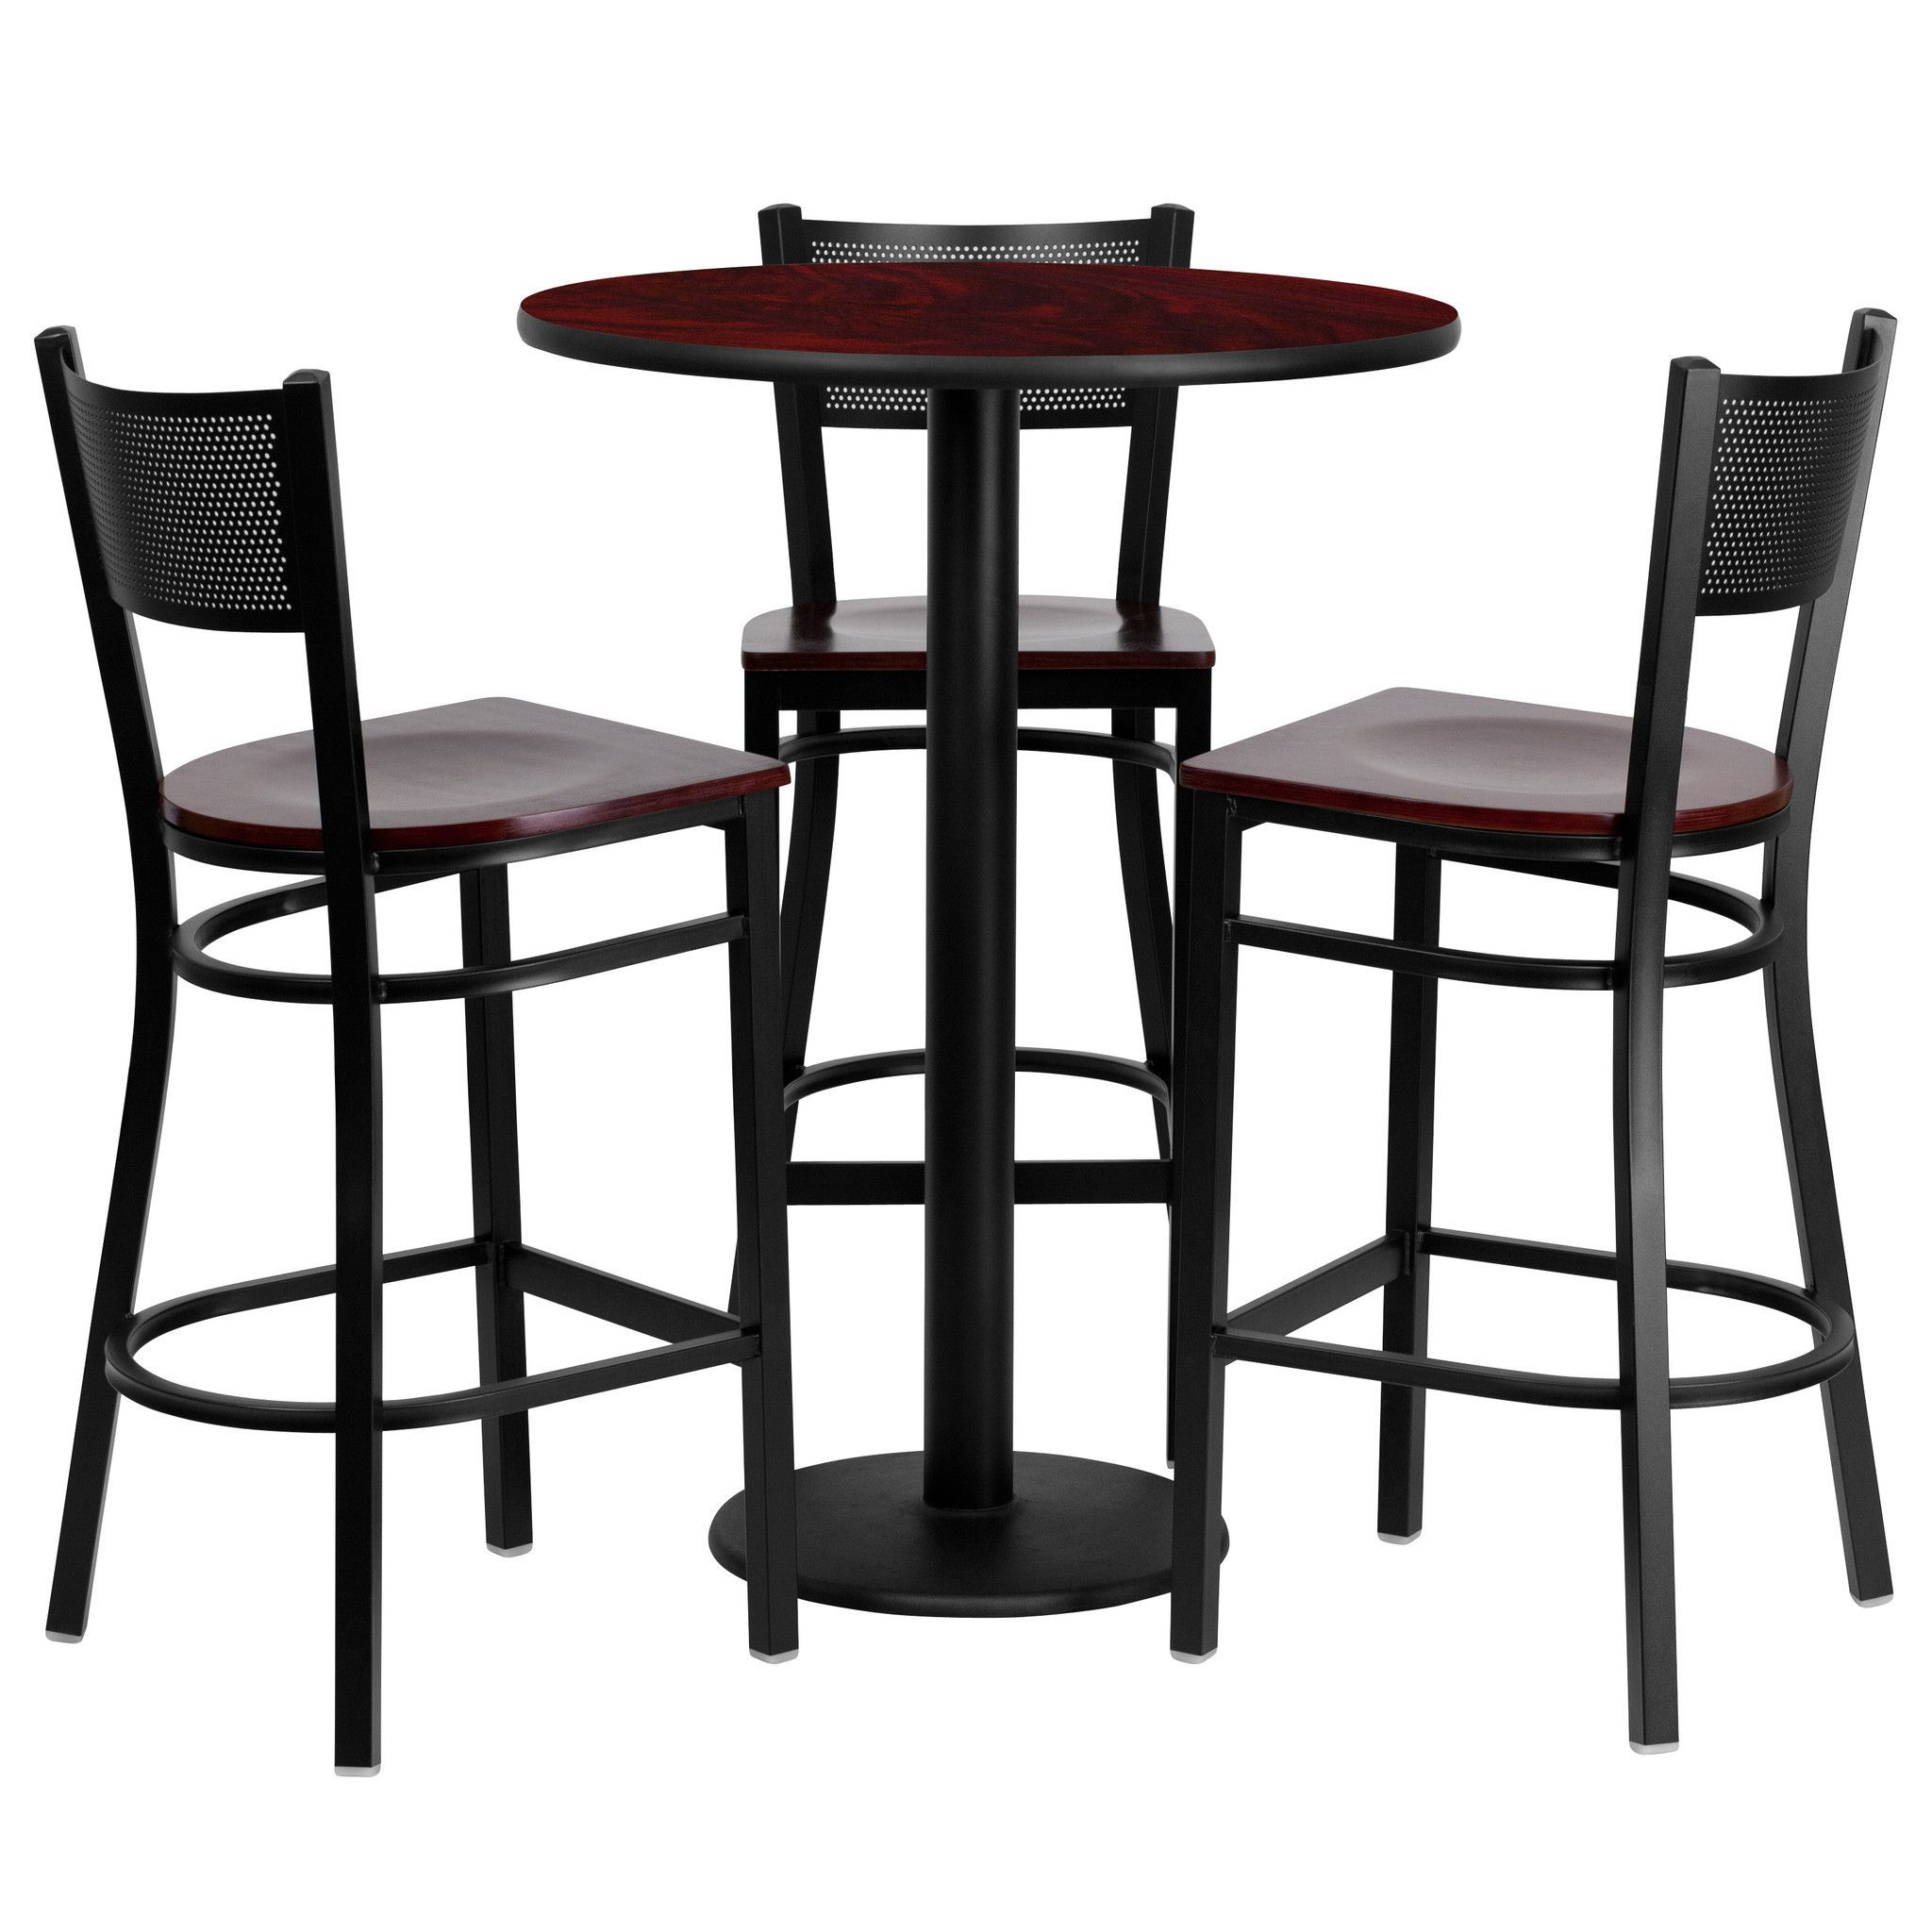 30'' Round Mahogany Table Set with 3 Grid Back Metal Bar Stools